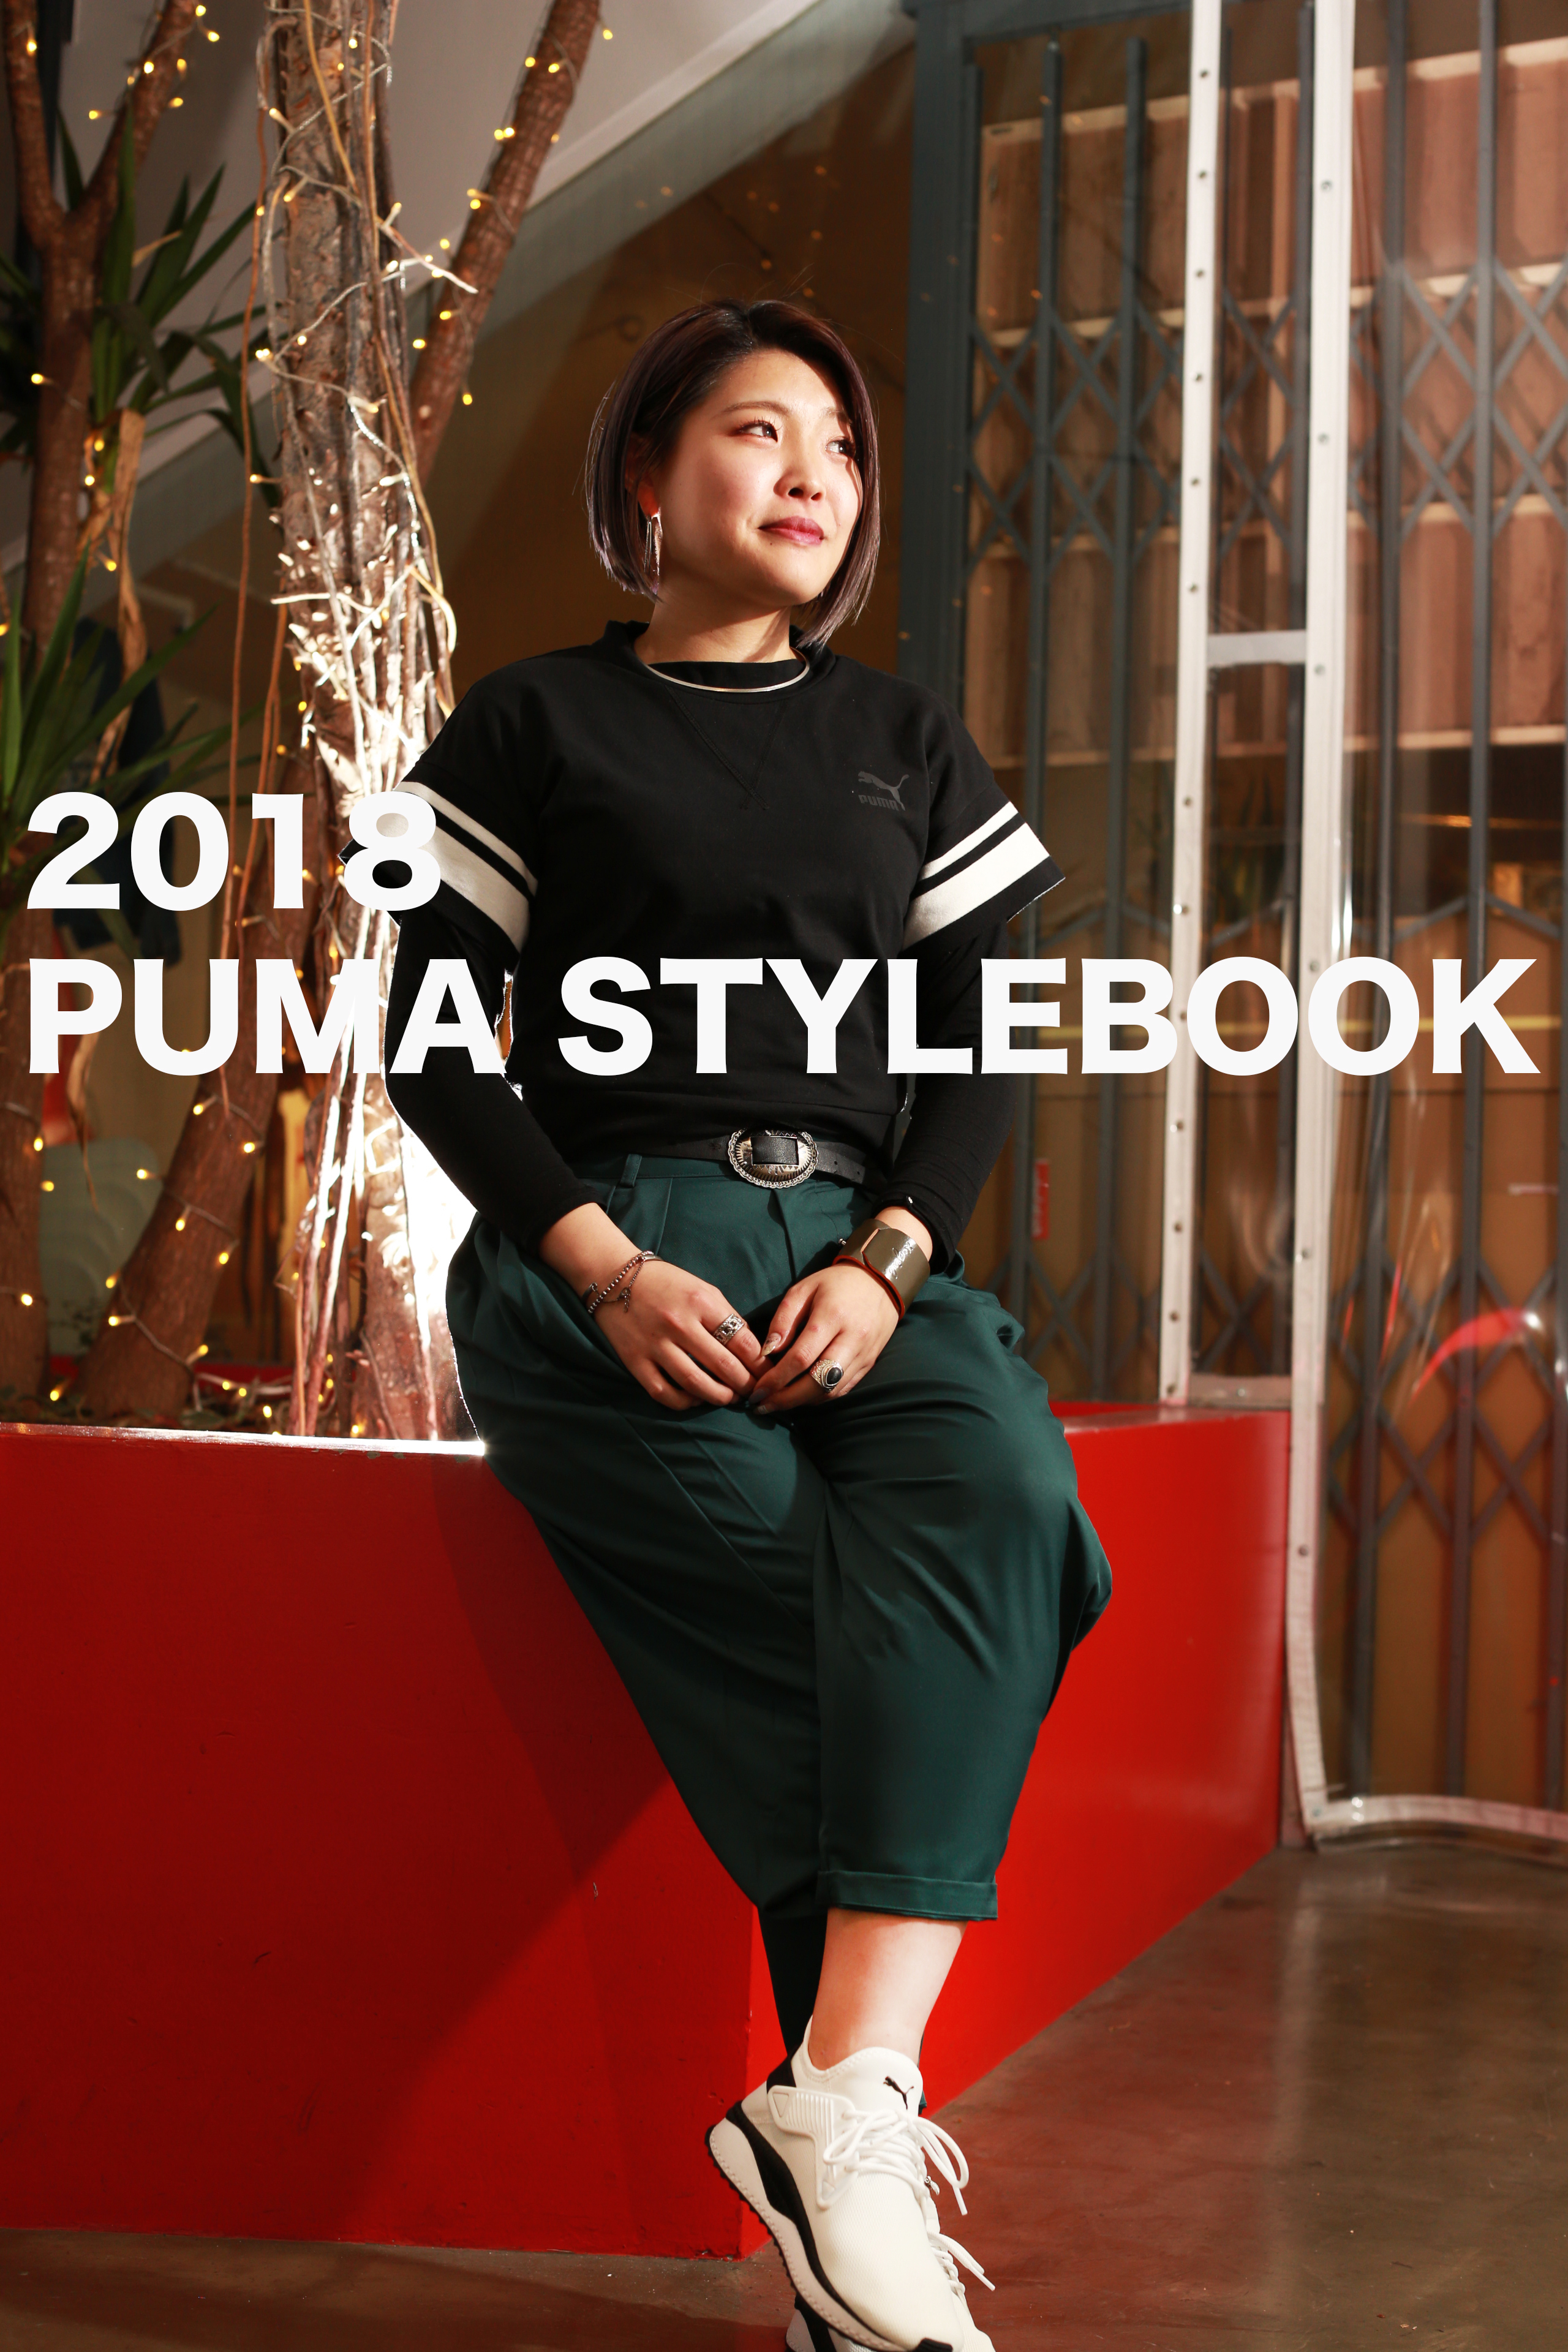 2018 PUMA STYLE BOOK